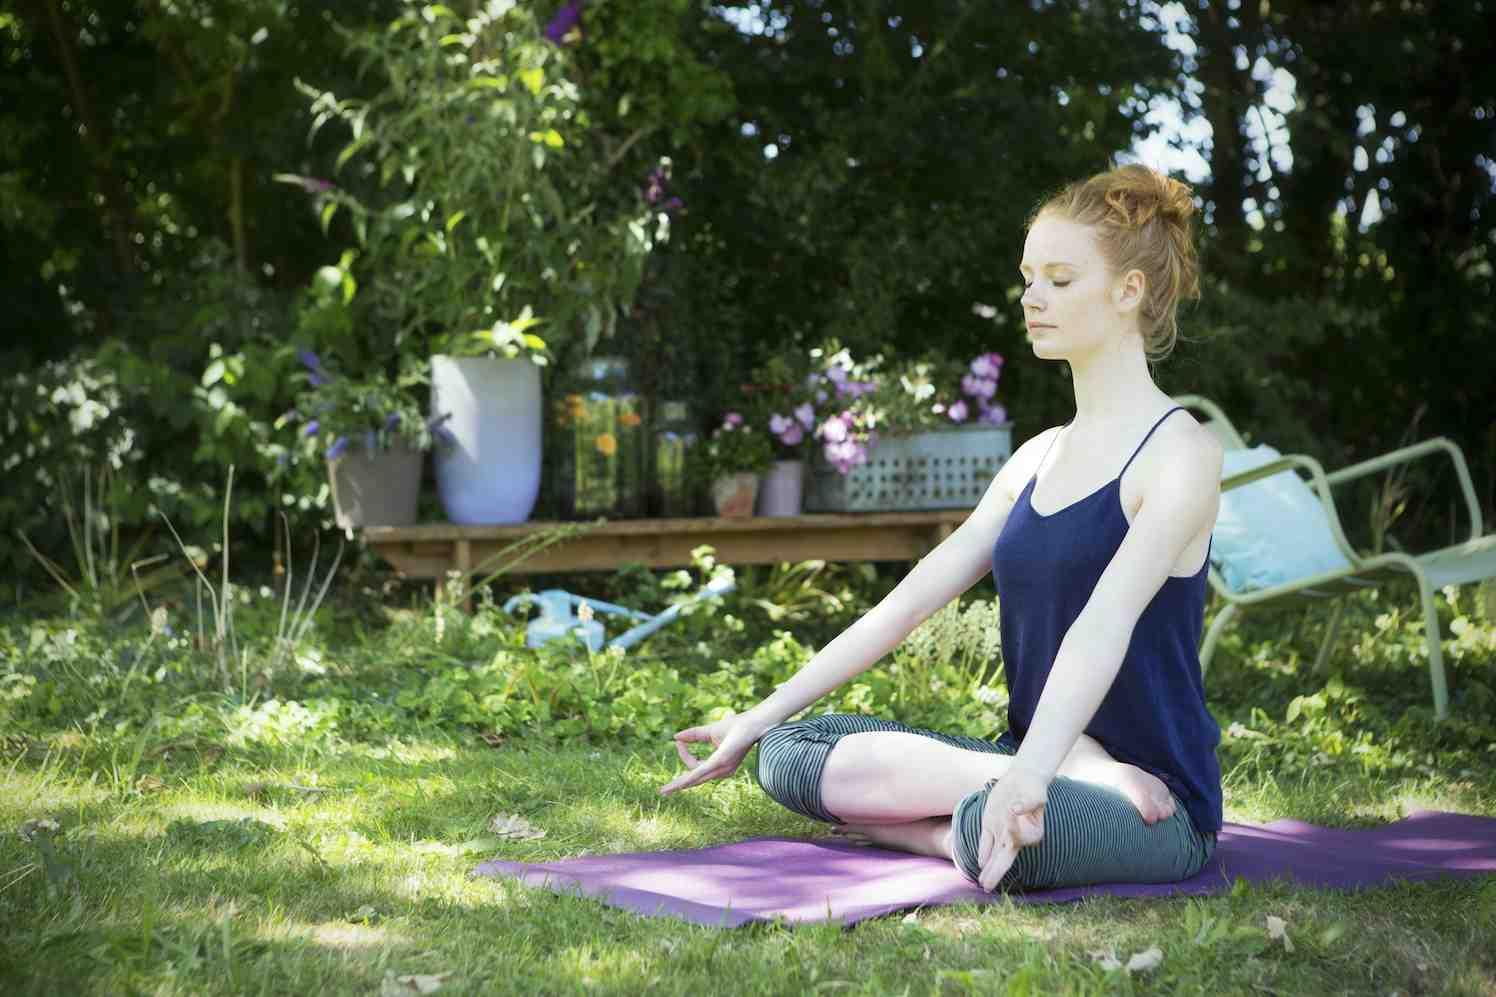 21 juni 2017: Internationale Yoga dag